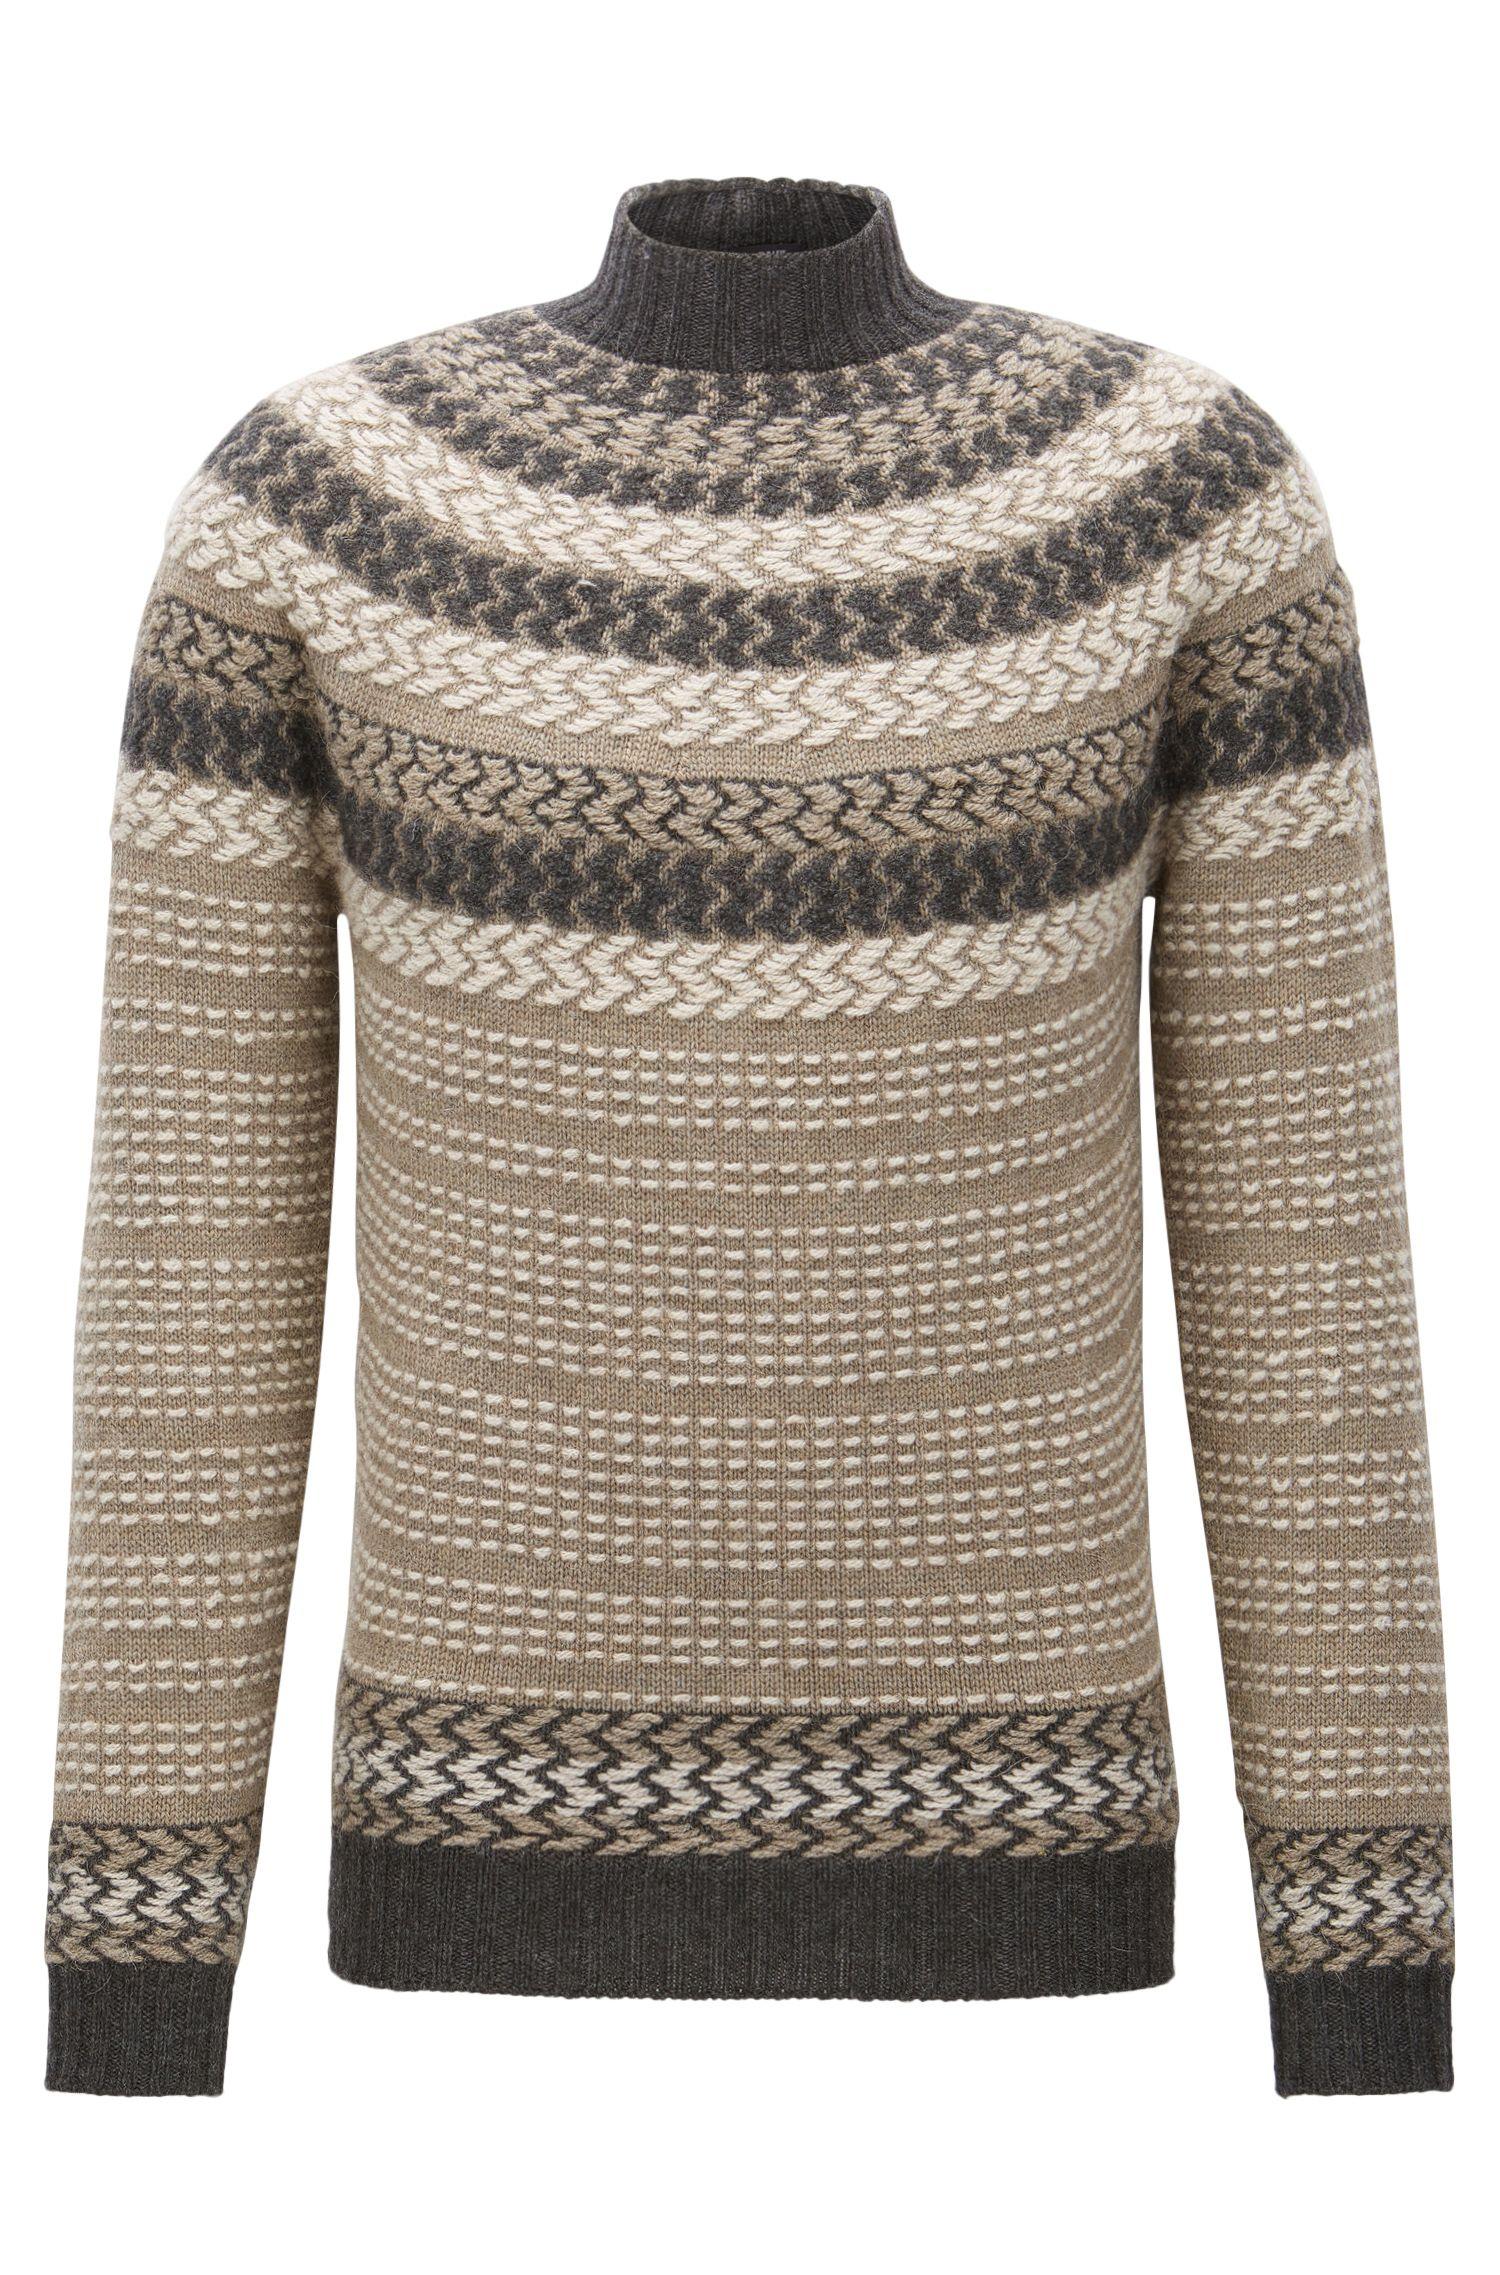 Virgin Wool-Alpaca Turtleneck Sweater | Nateus